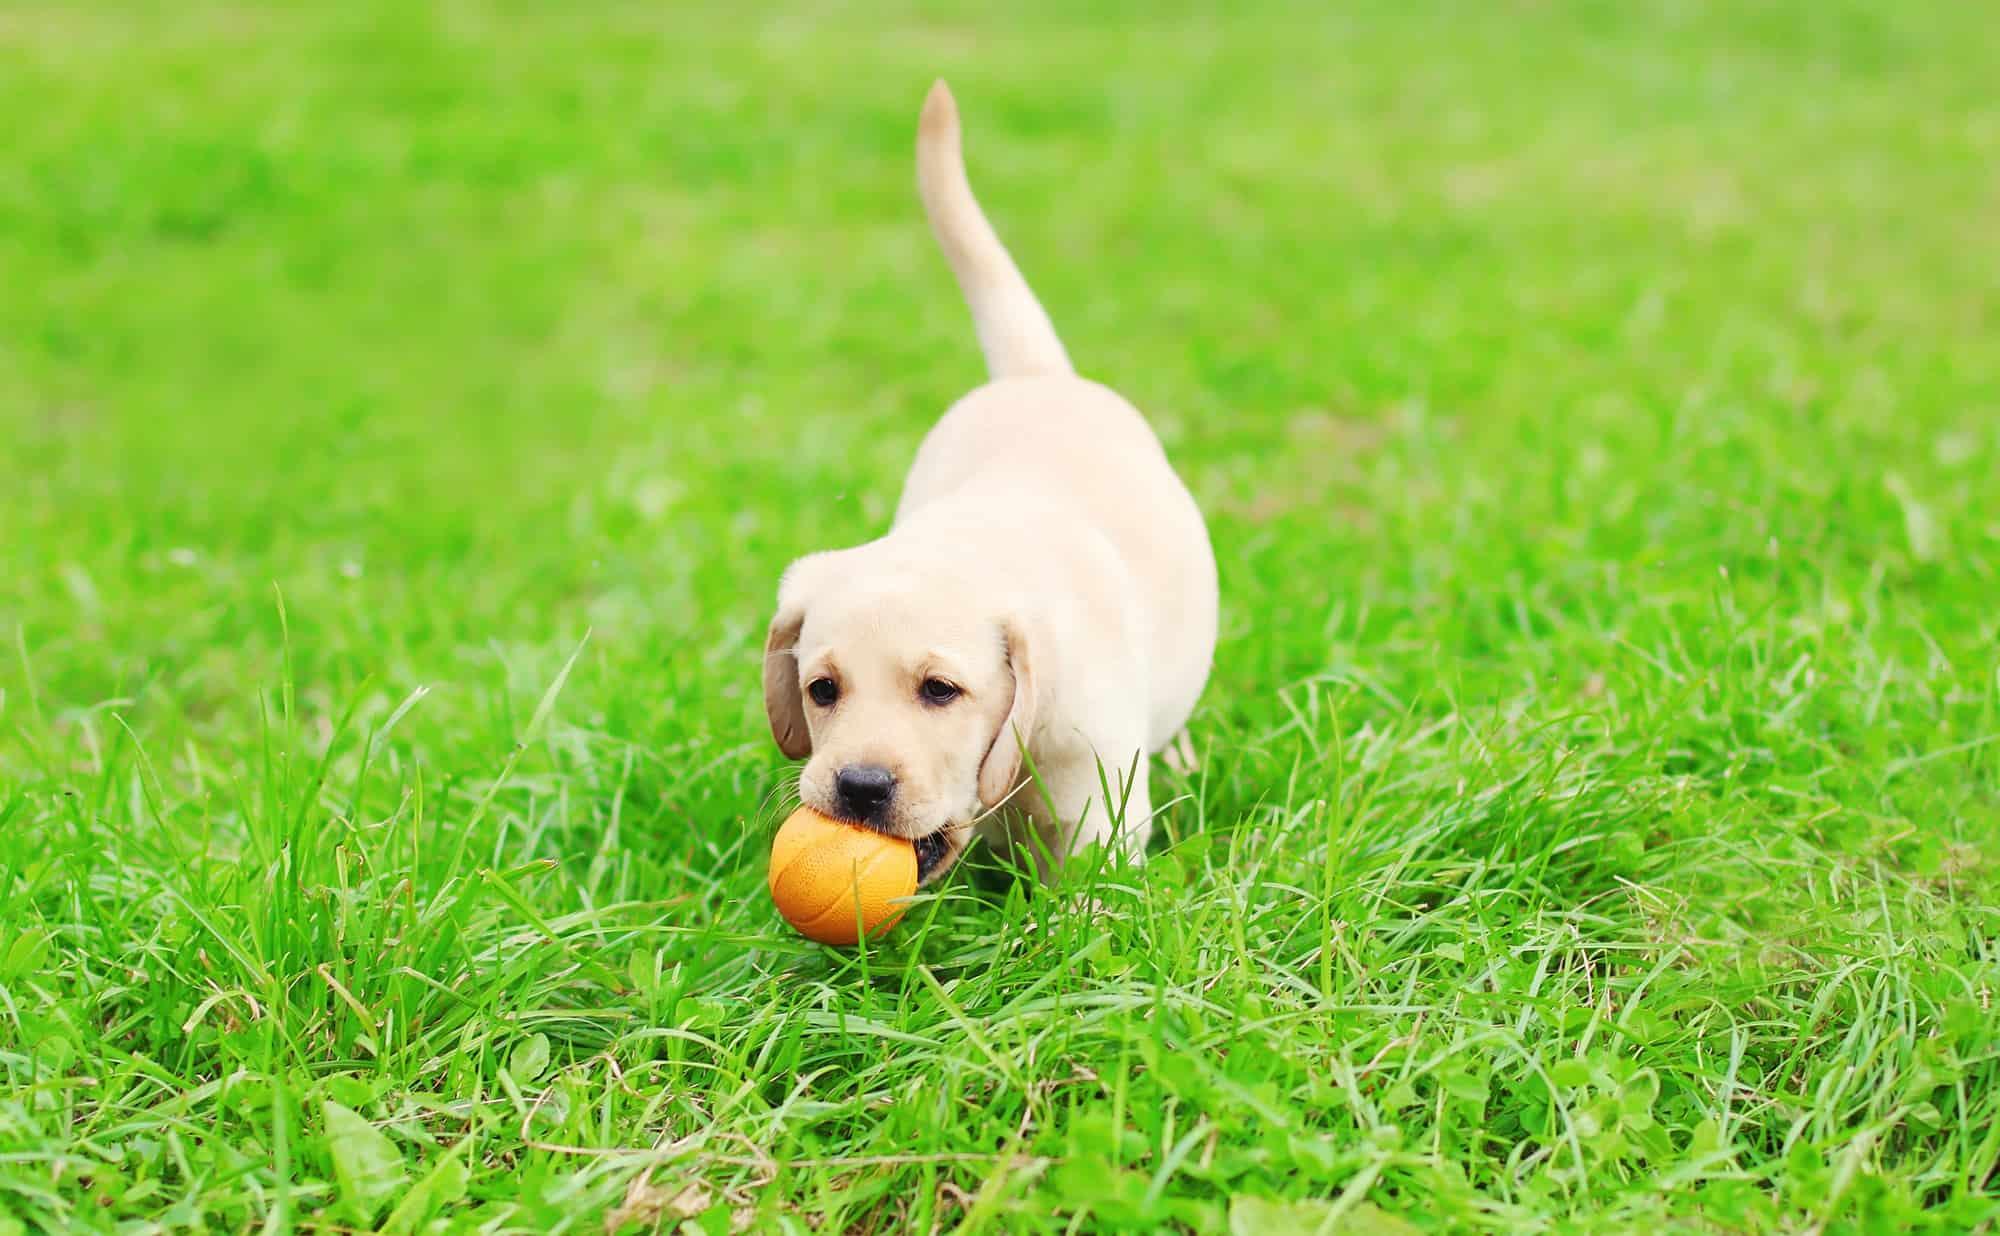 Lab puppy playing ball on lush grass